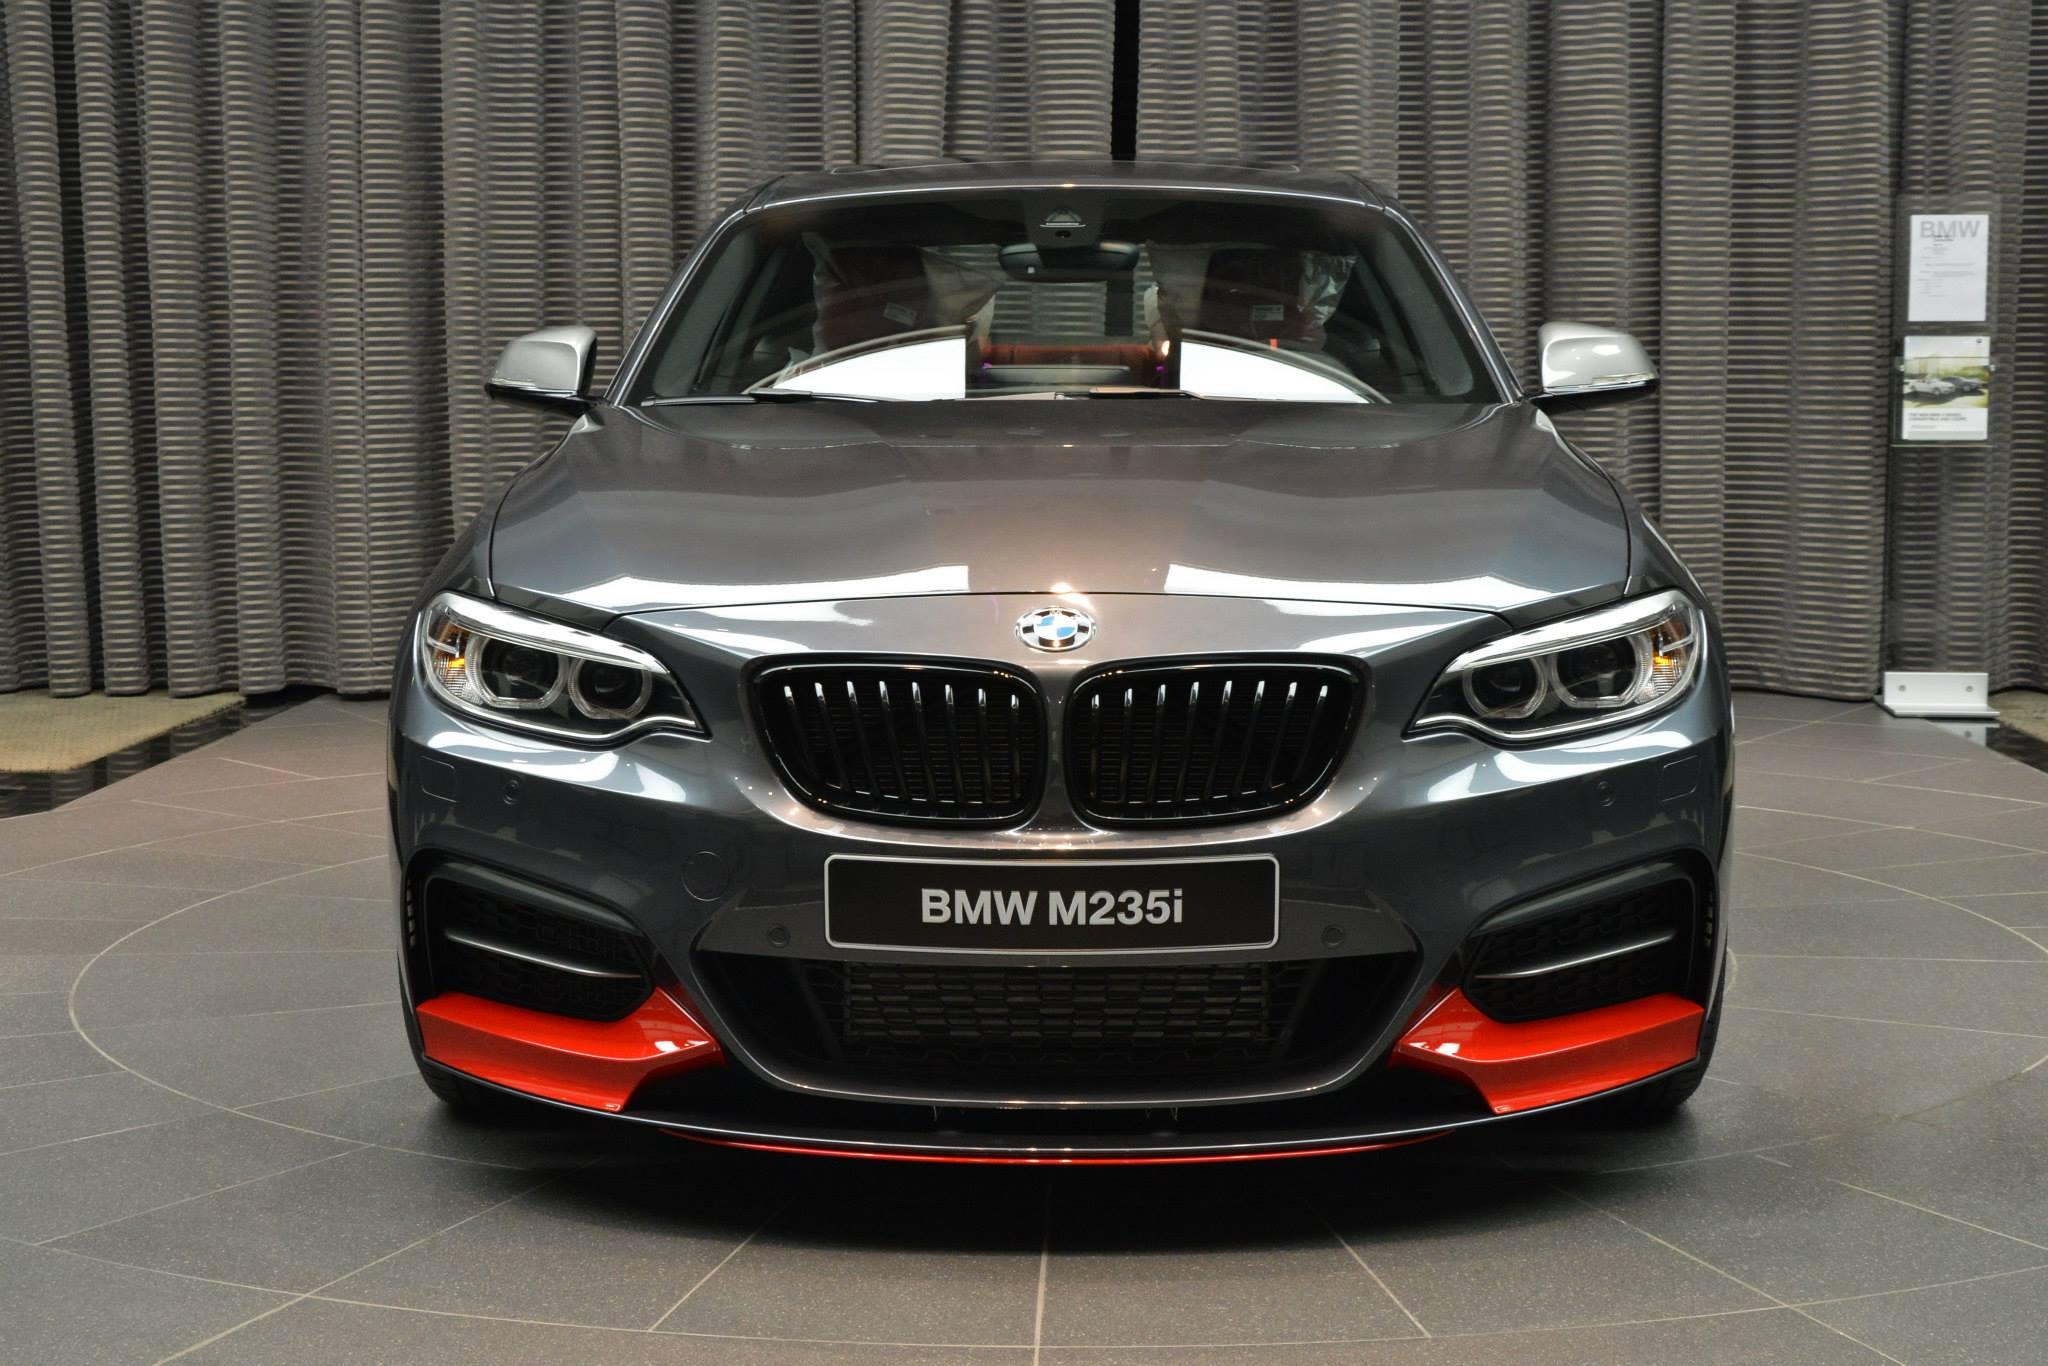 BMW M235i F22 M Performance Zubehoer Tuning Mineralgrau Rot 02